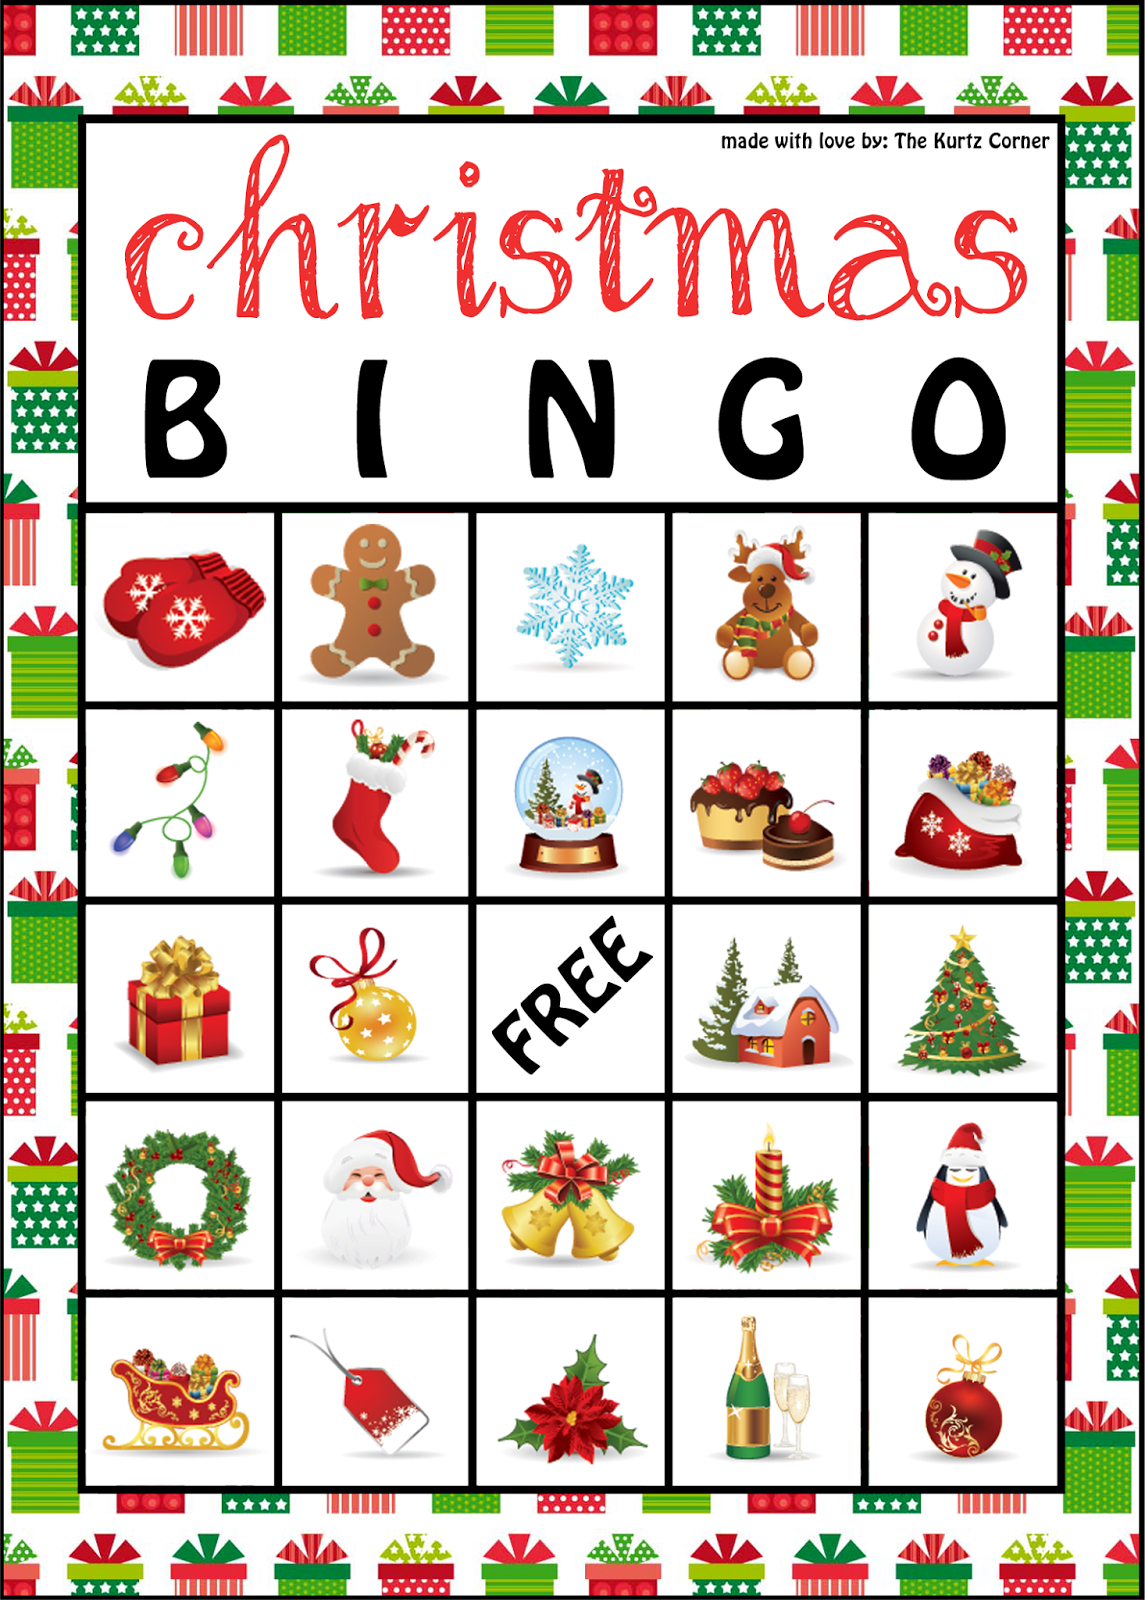 The Kurtz Corner: Free Printable Christmas Bingo Cards | Winter / X - 20 Free Printable Christmas Bingo Cards